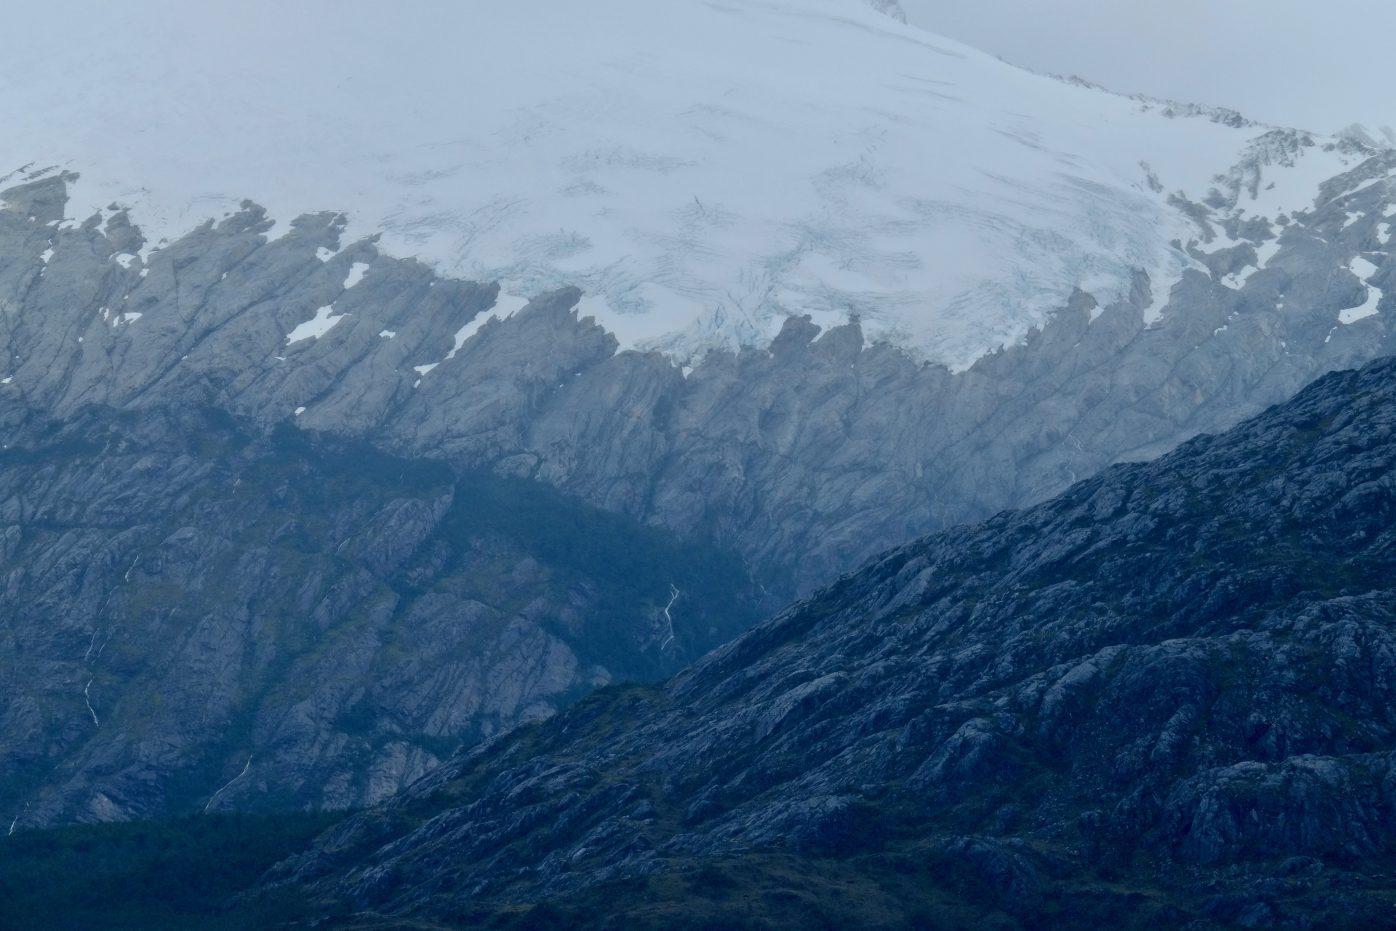 La roche sombre des fjords de la terre de feu